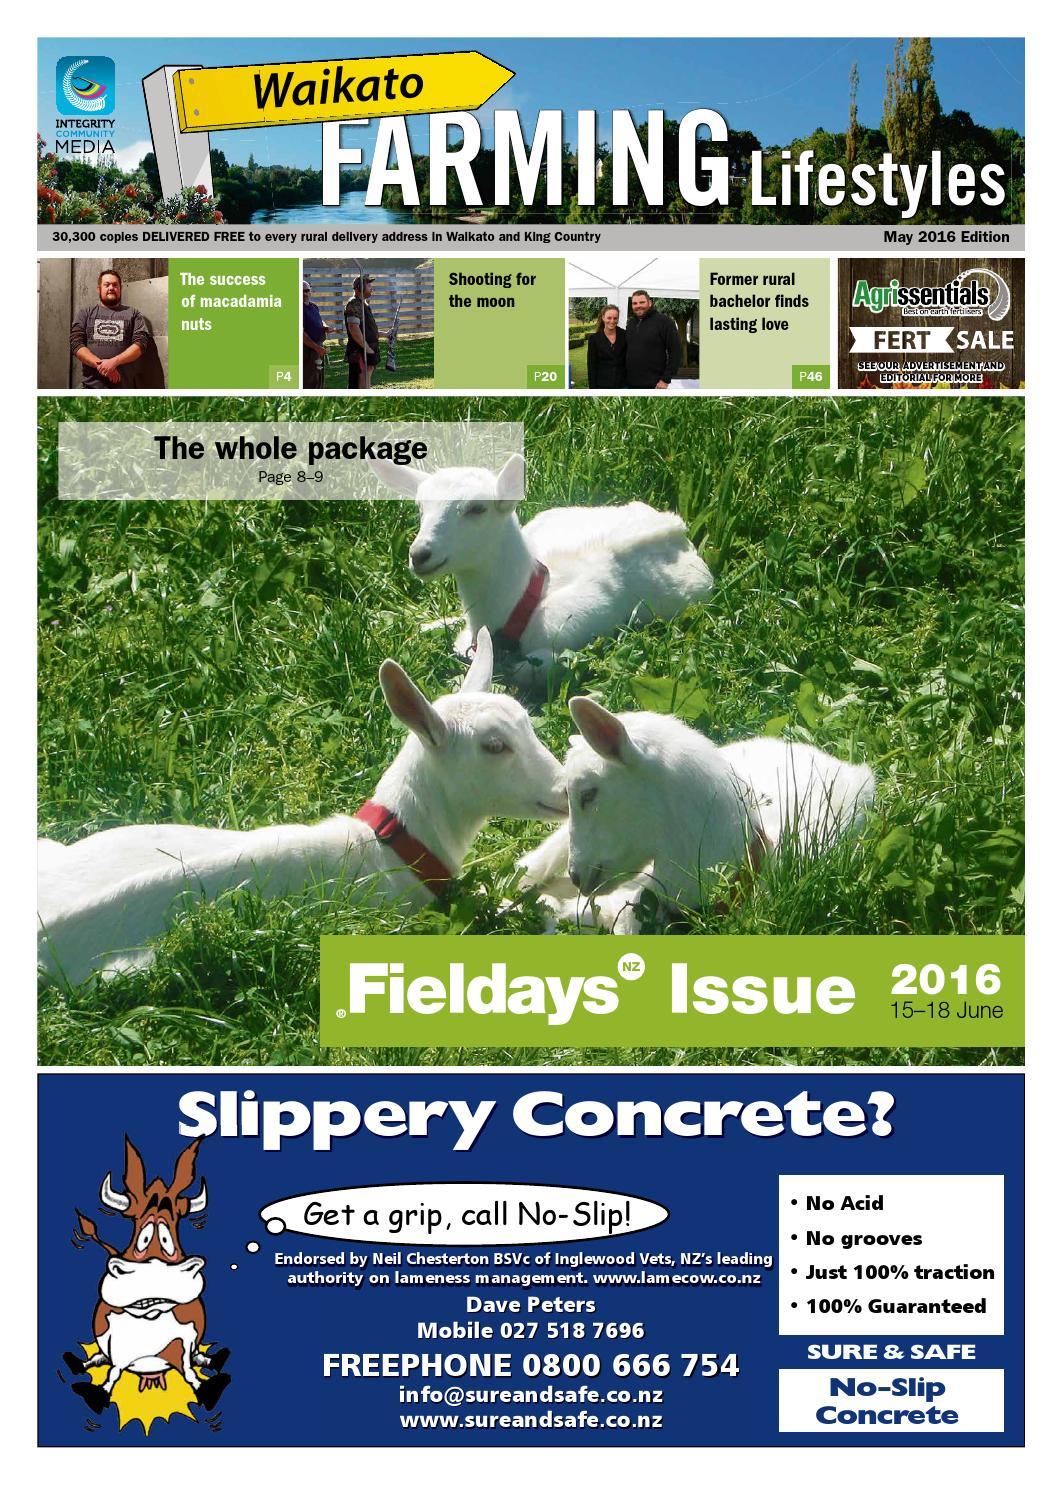 Waikato Farming Lifestyles, May 2016 by NorthSouth Multi Media Ltd - issuu